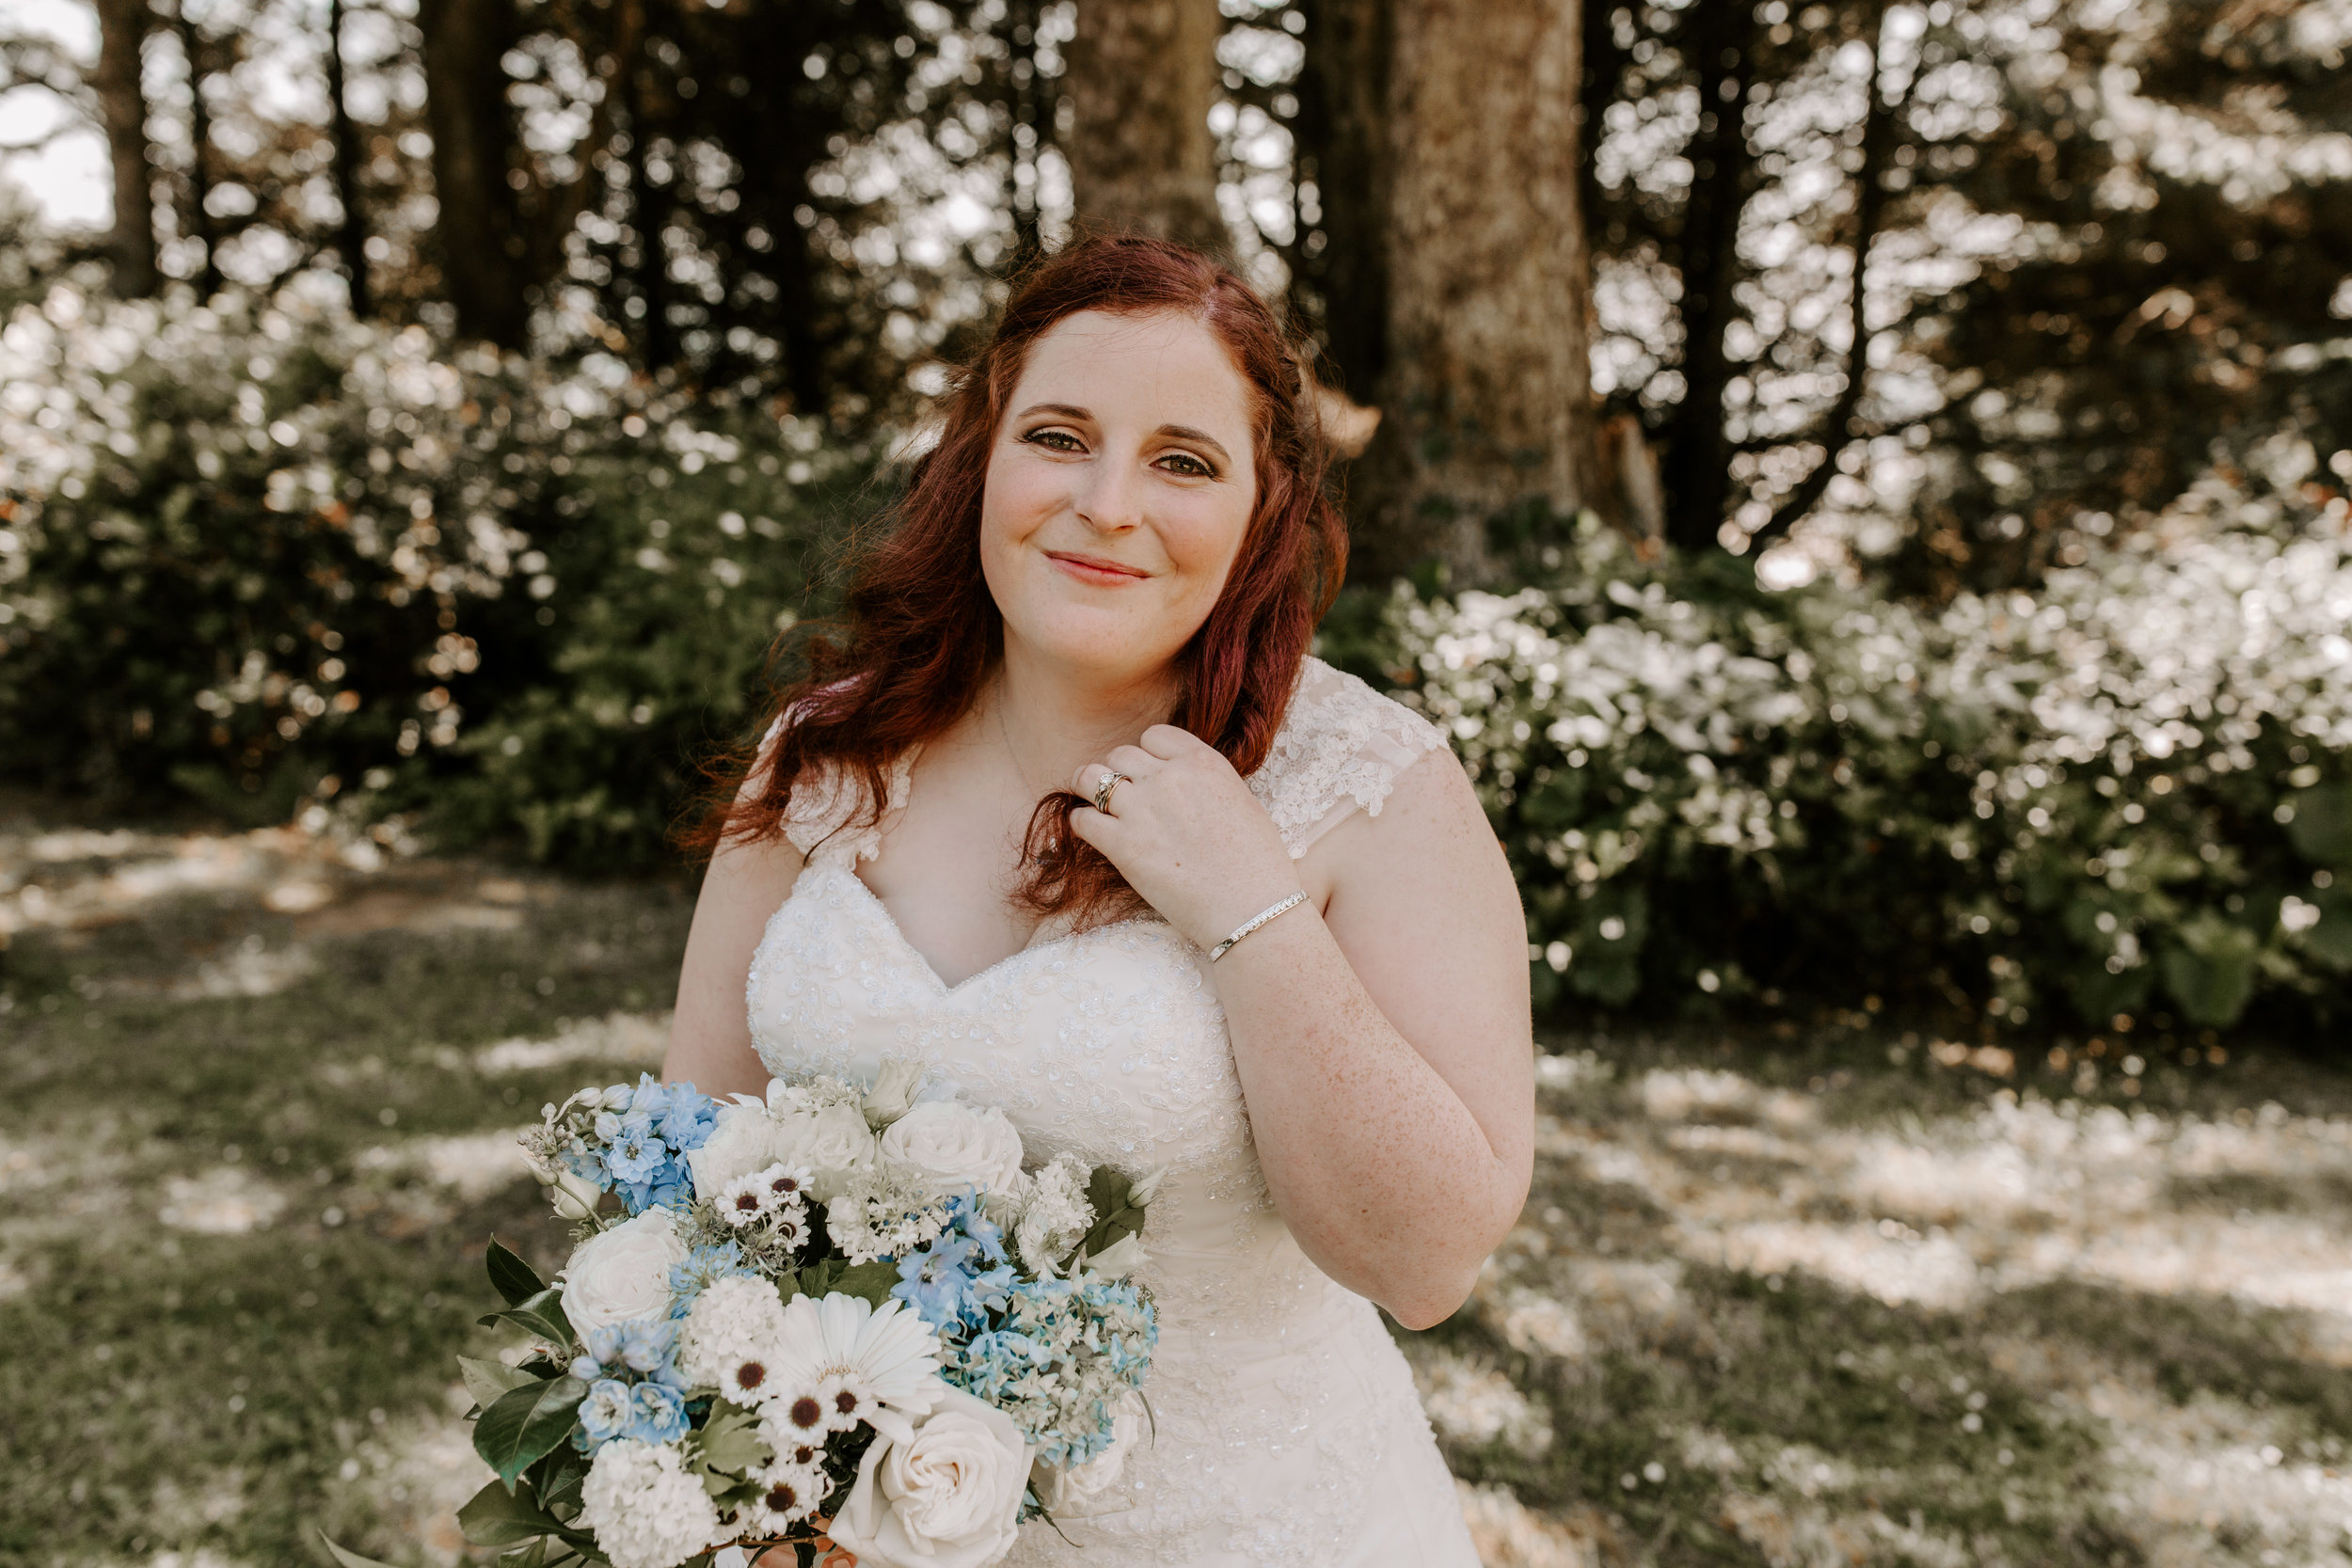 Oregon Wedding Photographer | Bridal Style | Rustic Bloom Photography